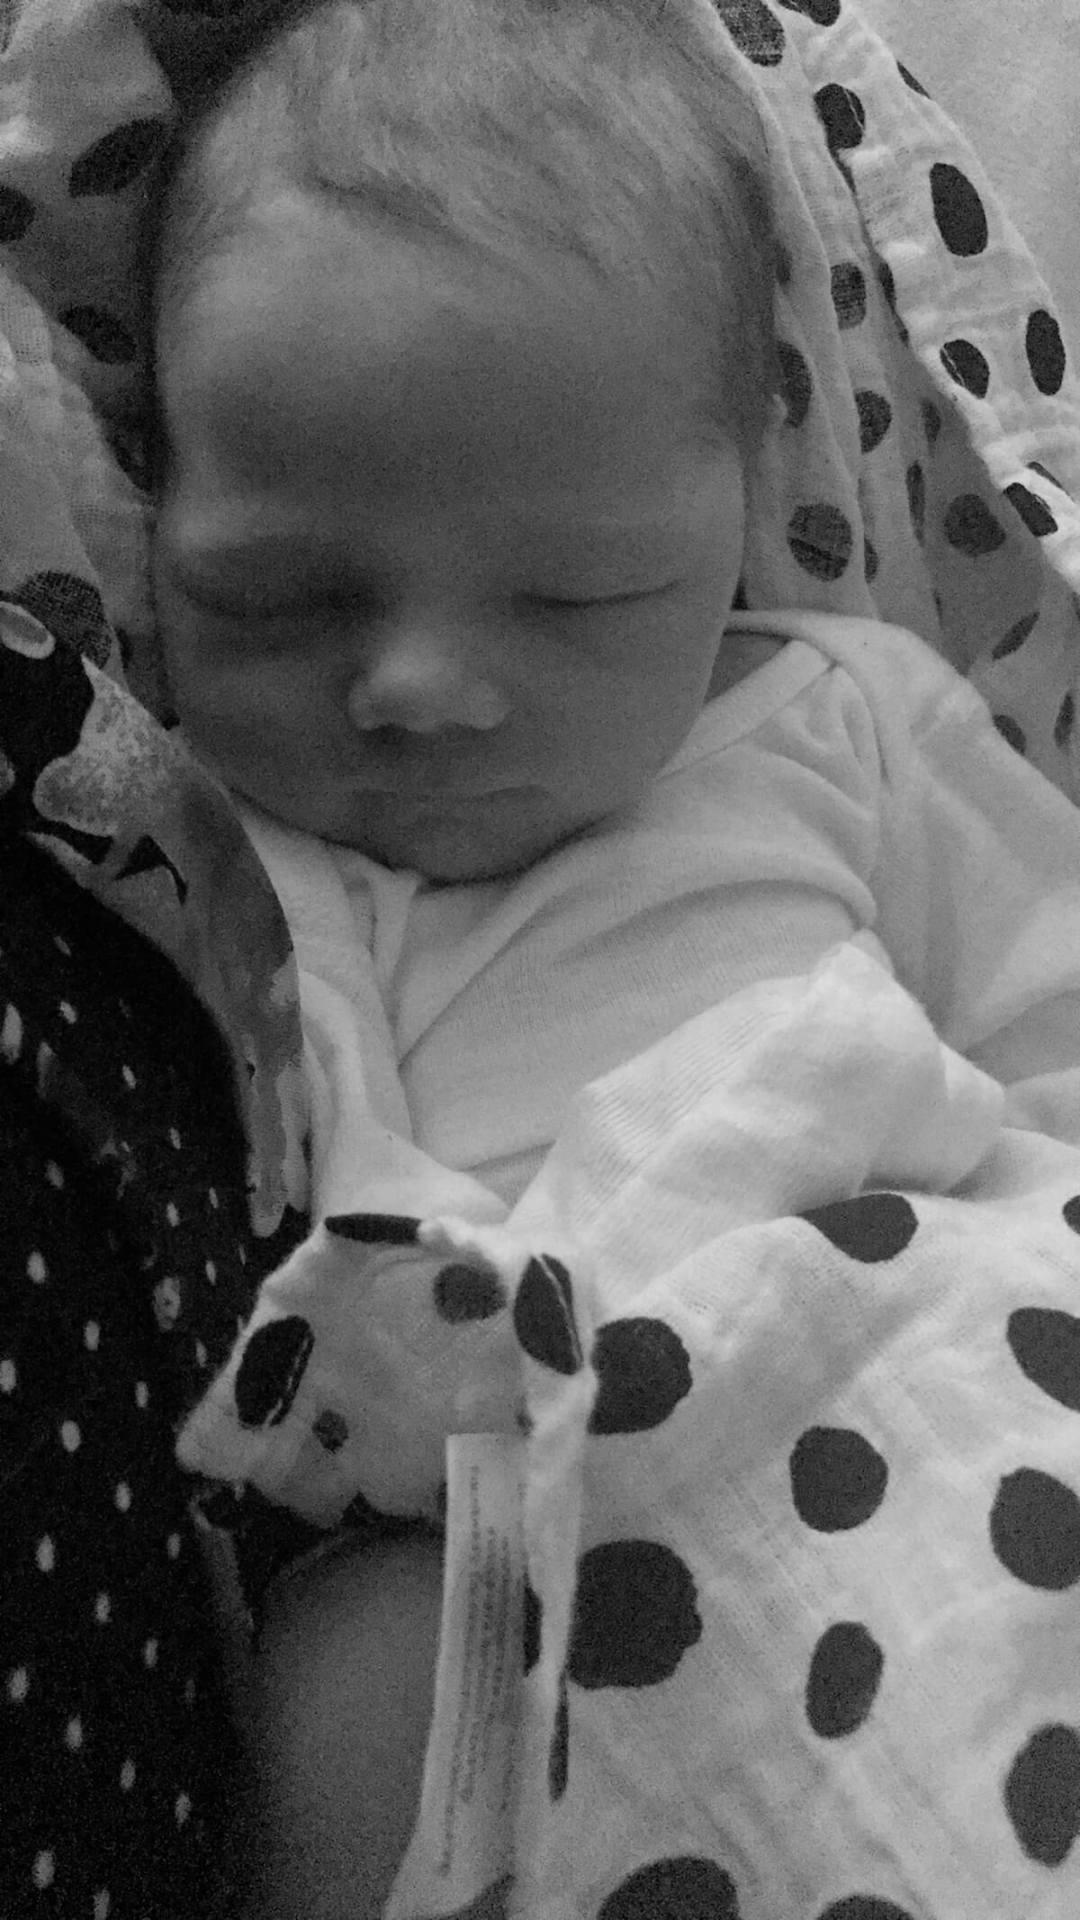 Newborn Ben